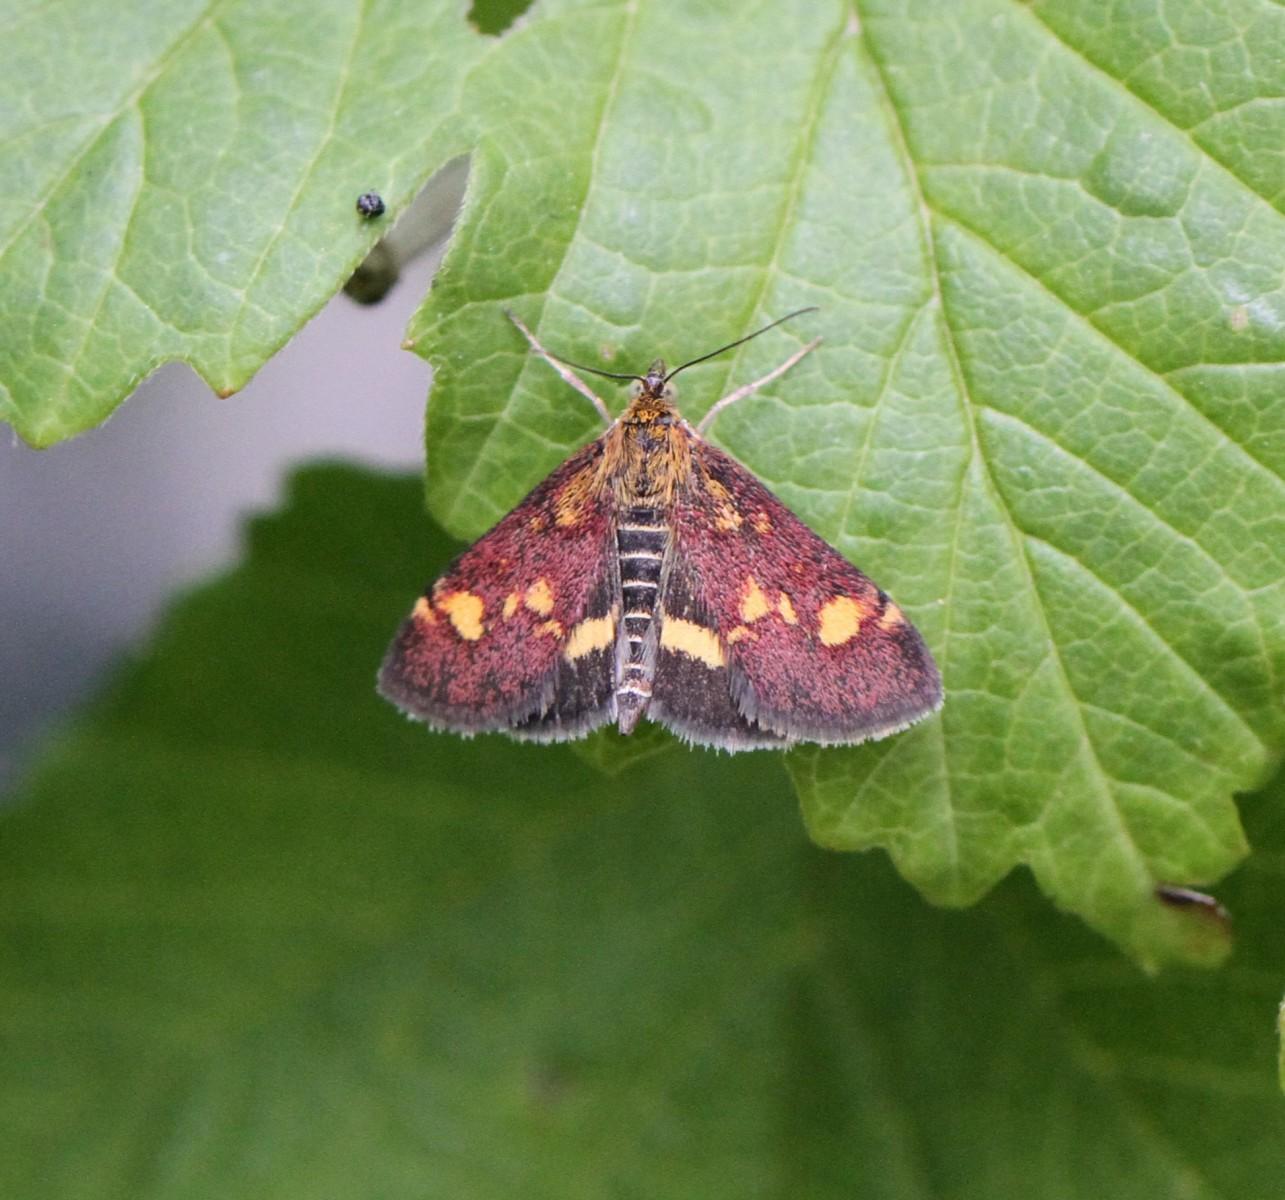 Pyrausta-purpuralis